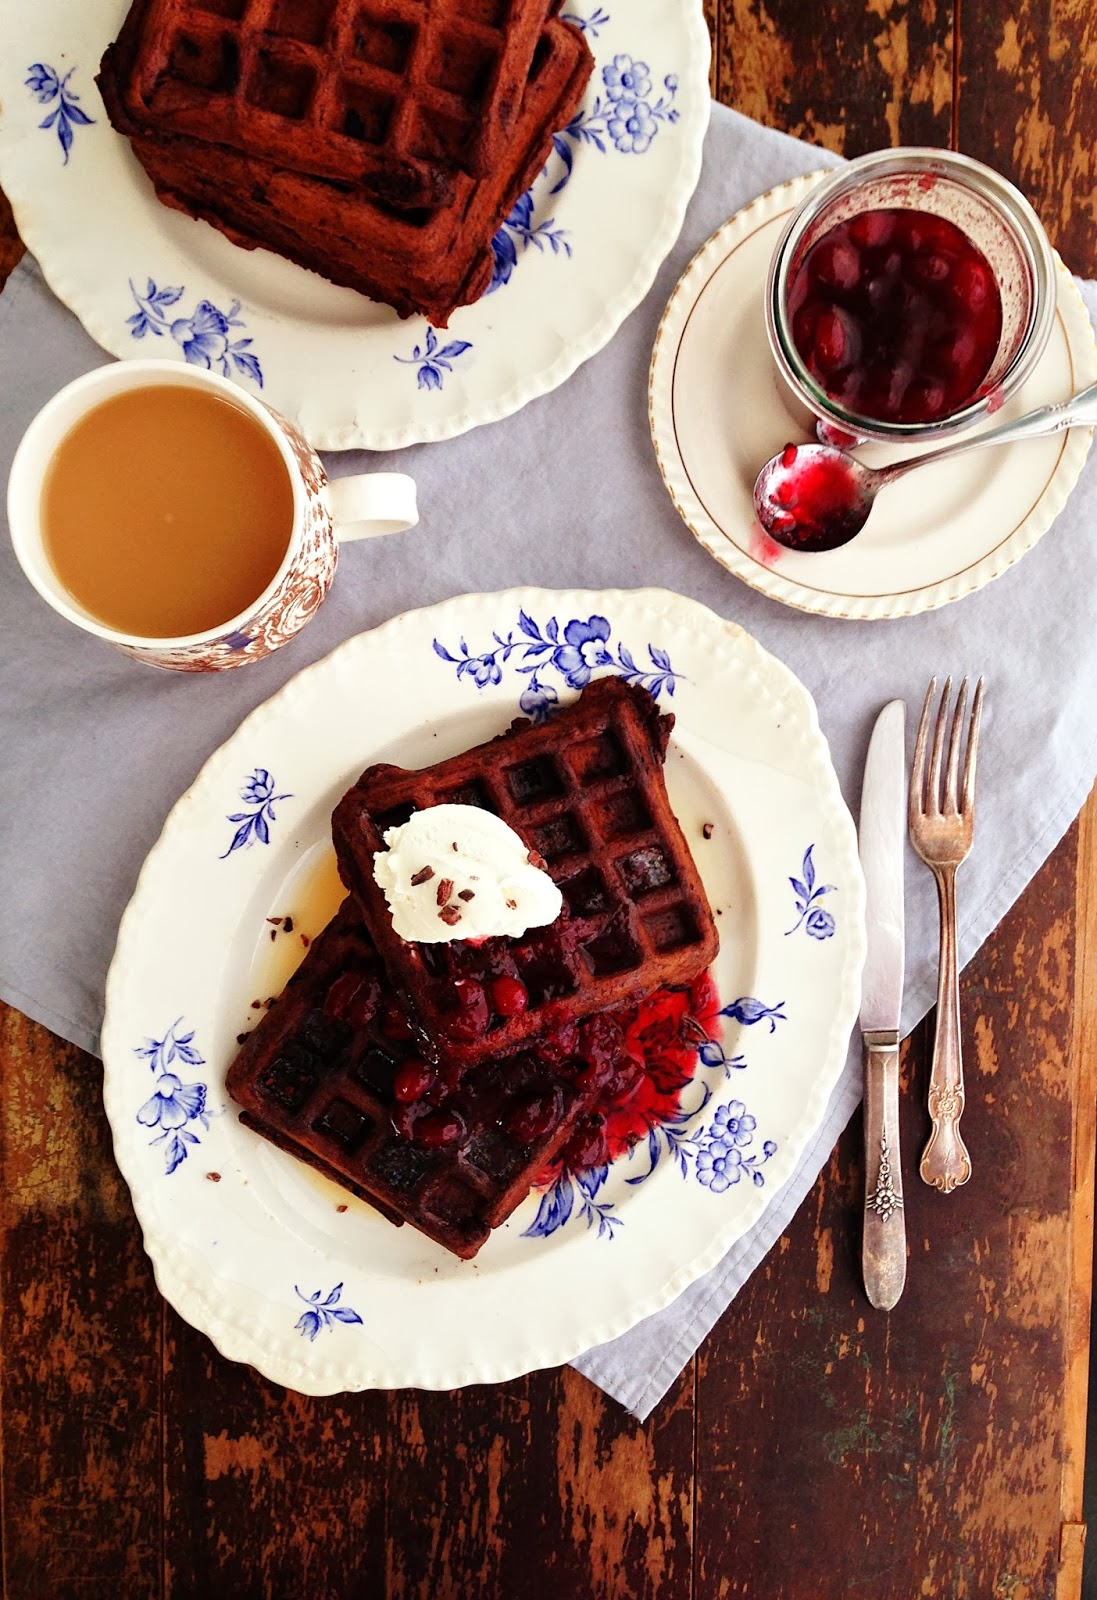 sweetsugarbean: Dark Chocolate Waffles & Oscar Talk